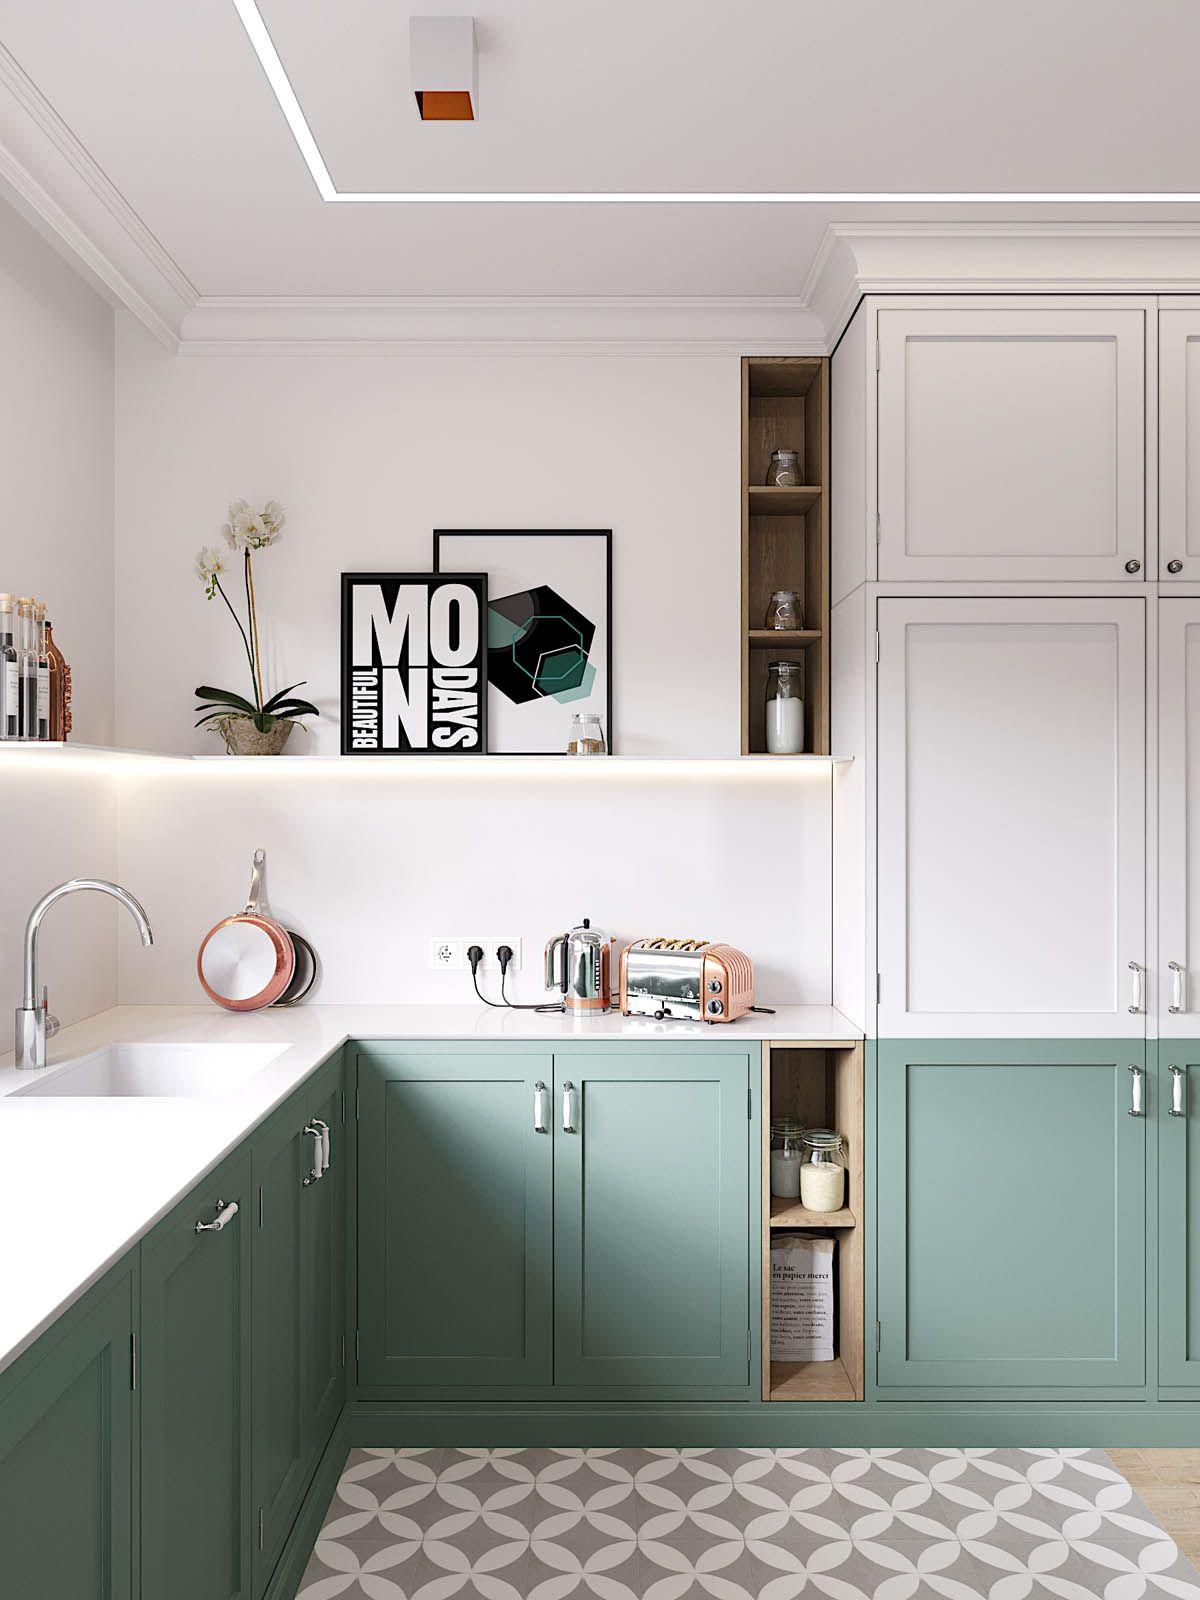 Elegant Scandinavian Style Home With Green Decor Small Kitchen Makeovers Kitchen Design Small Interior Design Kitchen